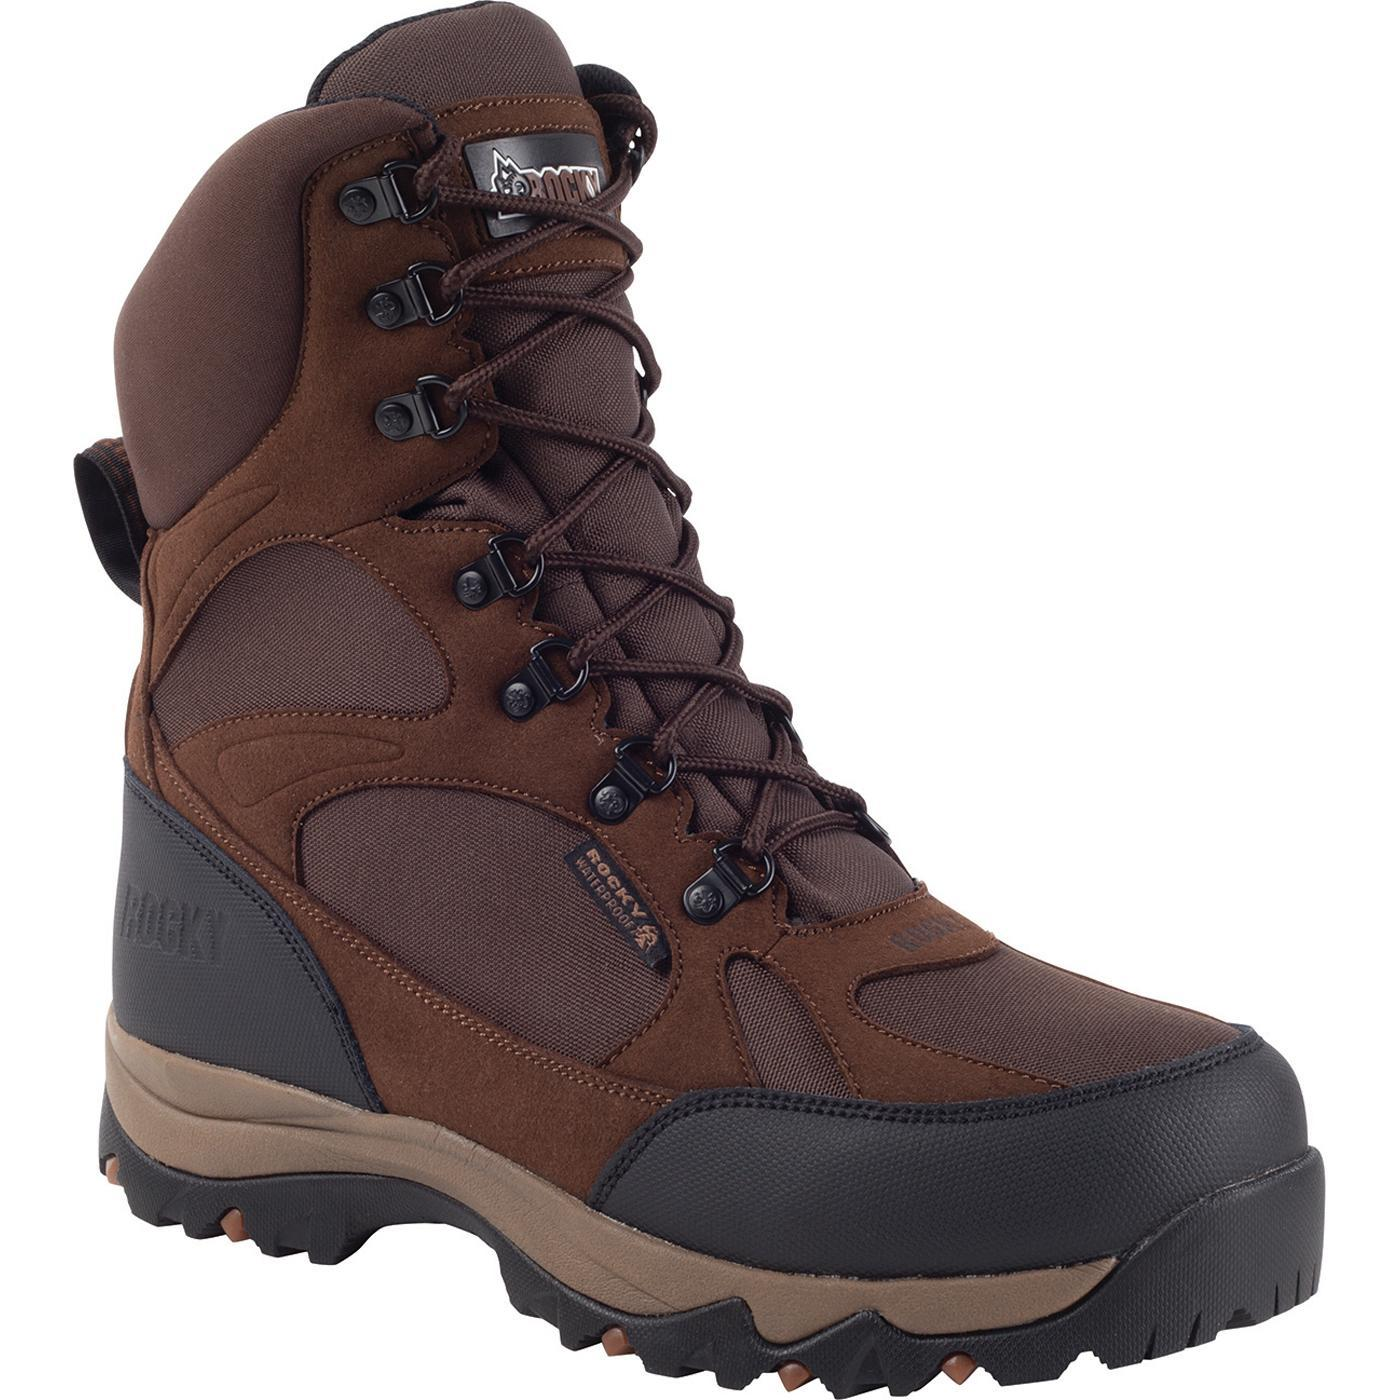 cbf1484072f Rocky Core Hiker Waterproof Insulated Boot